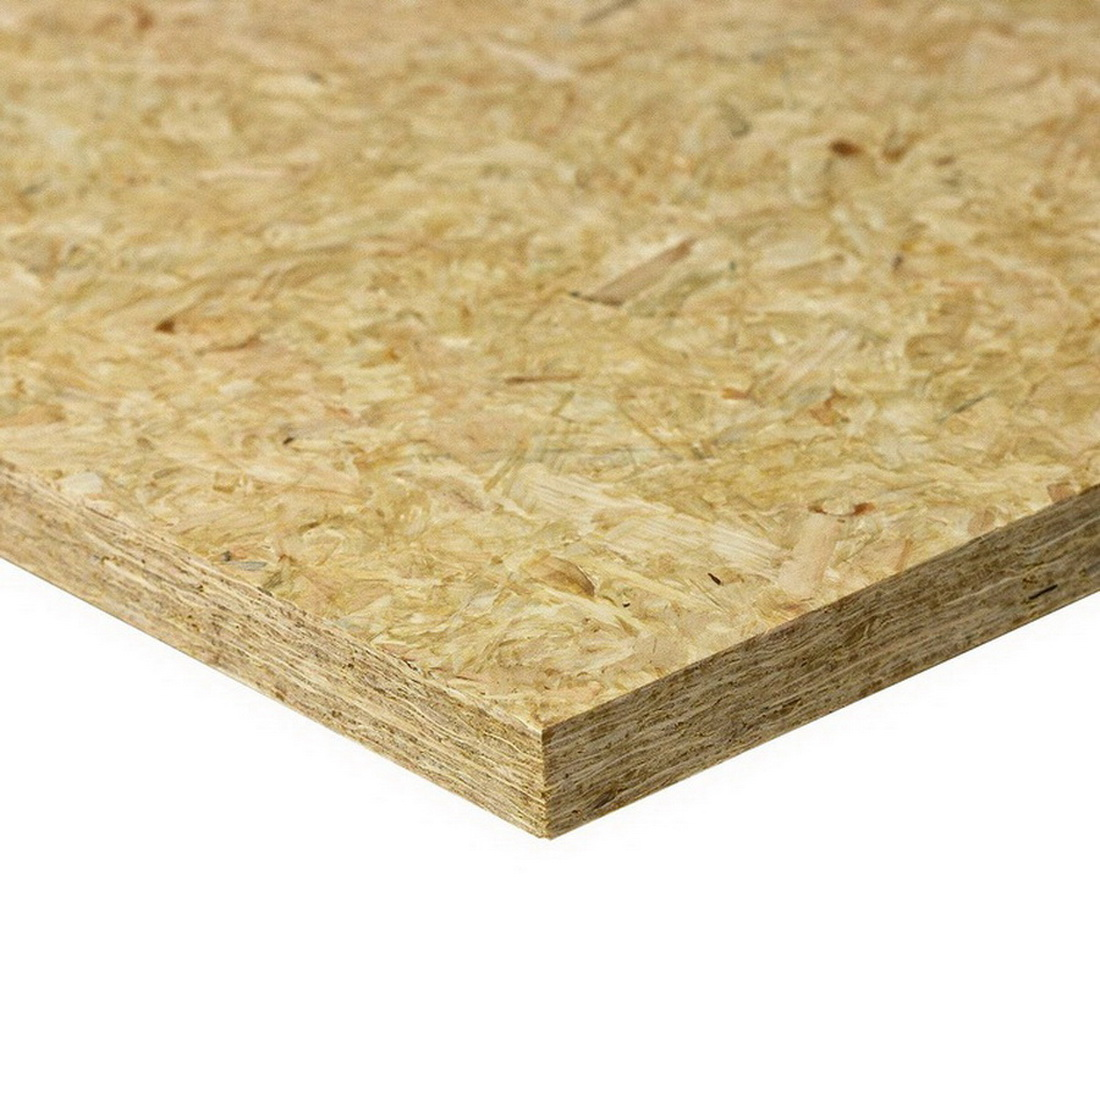 Strandfloor 2400 x 1200 x 20mm Square Edge Wood Panel H3.1 Treated